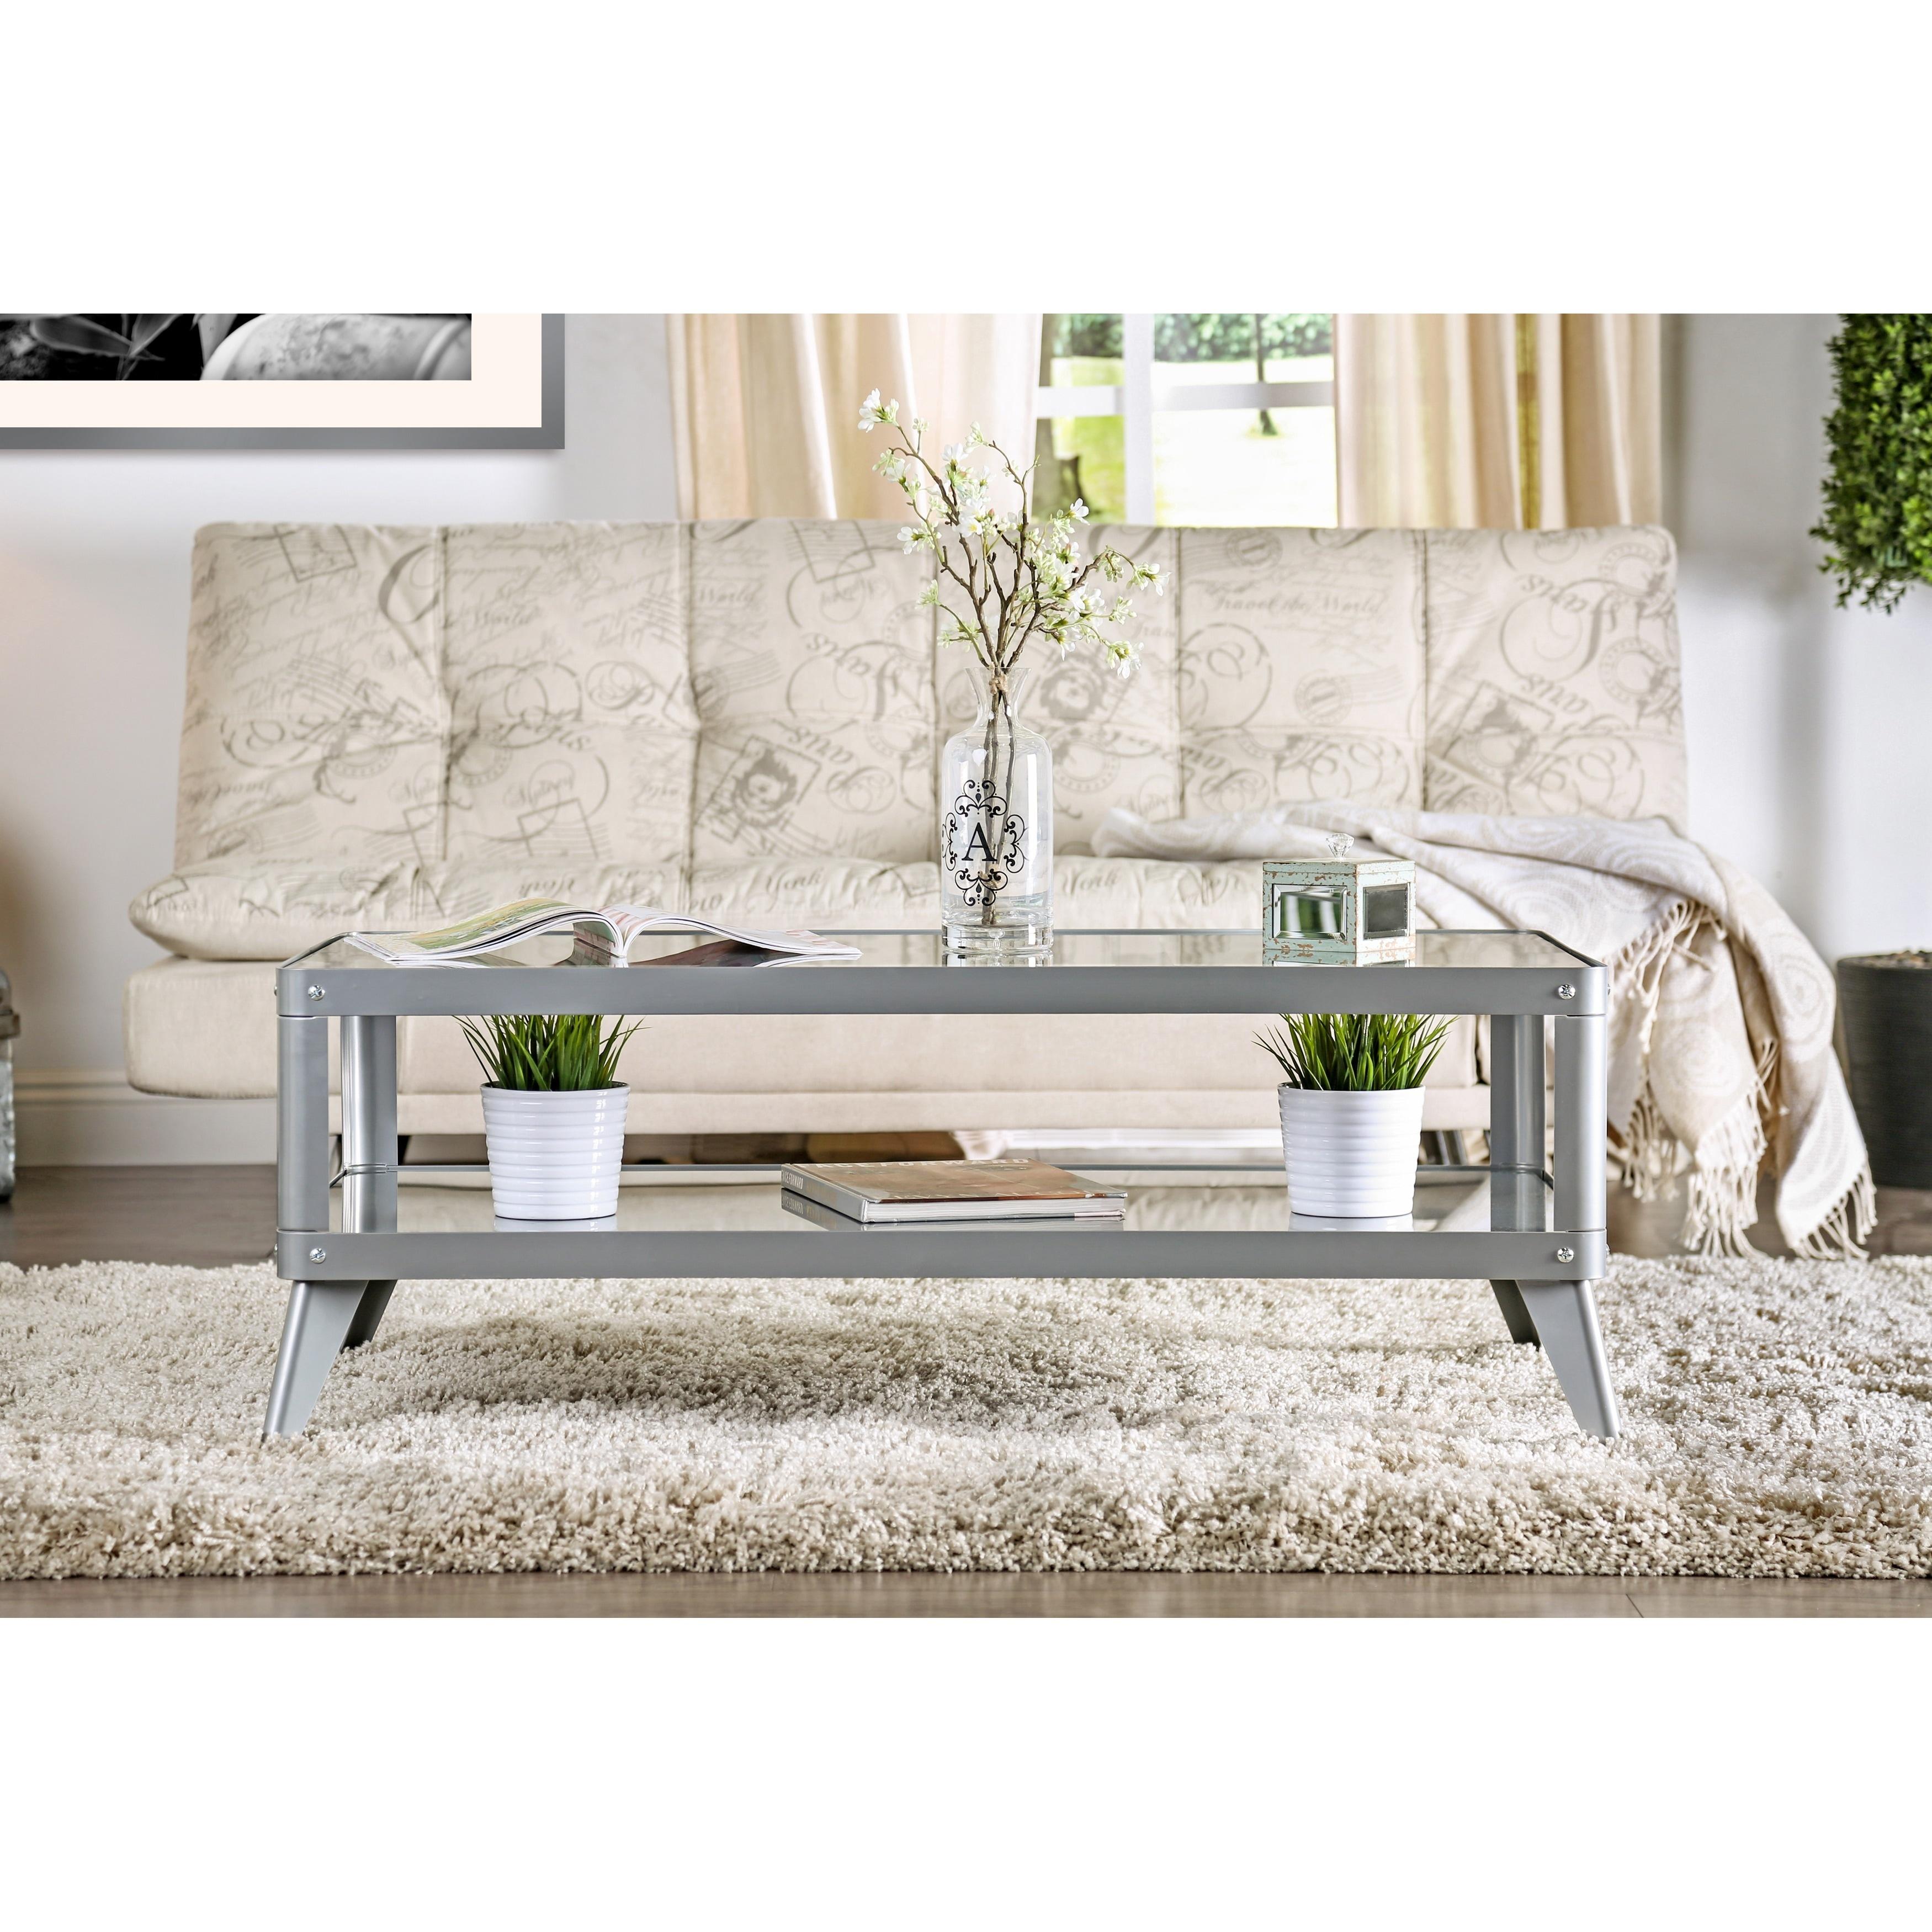 Furniture of America Linden Modern 3 piece Glass Top Metal Accent